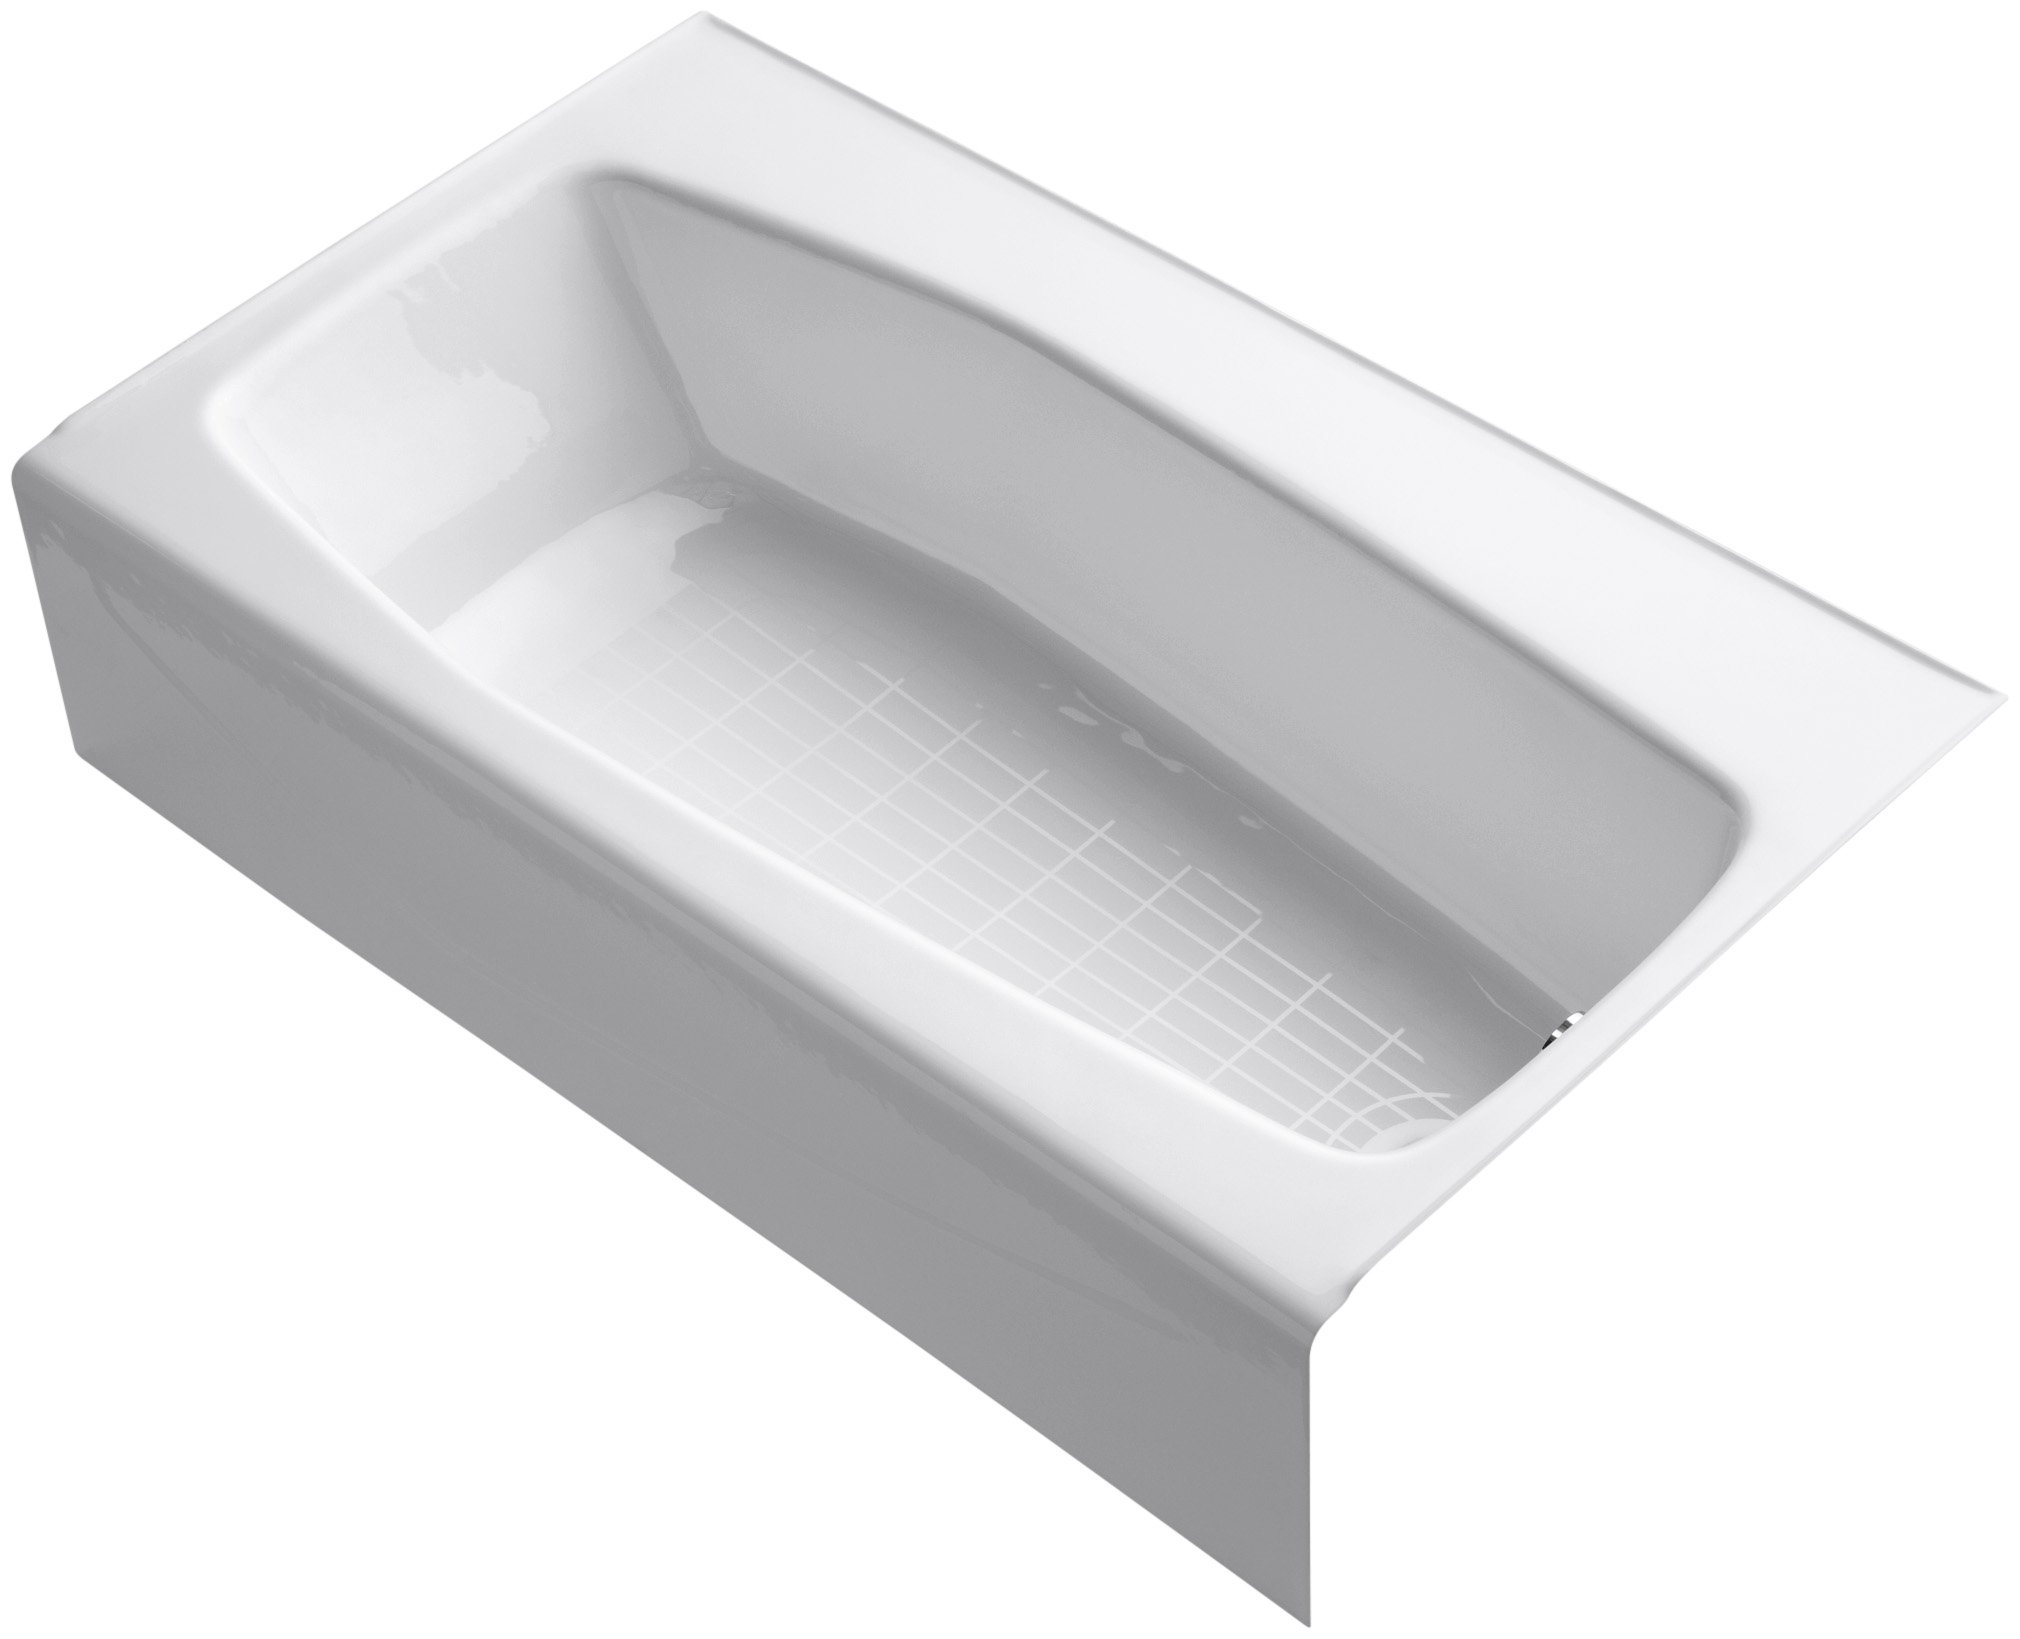 KOHLER K-714-0 Villager Bath with 4-Inch Ledge and Right-Hand Drain, White